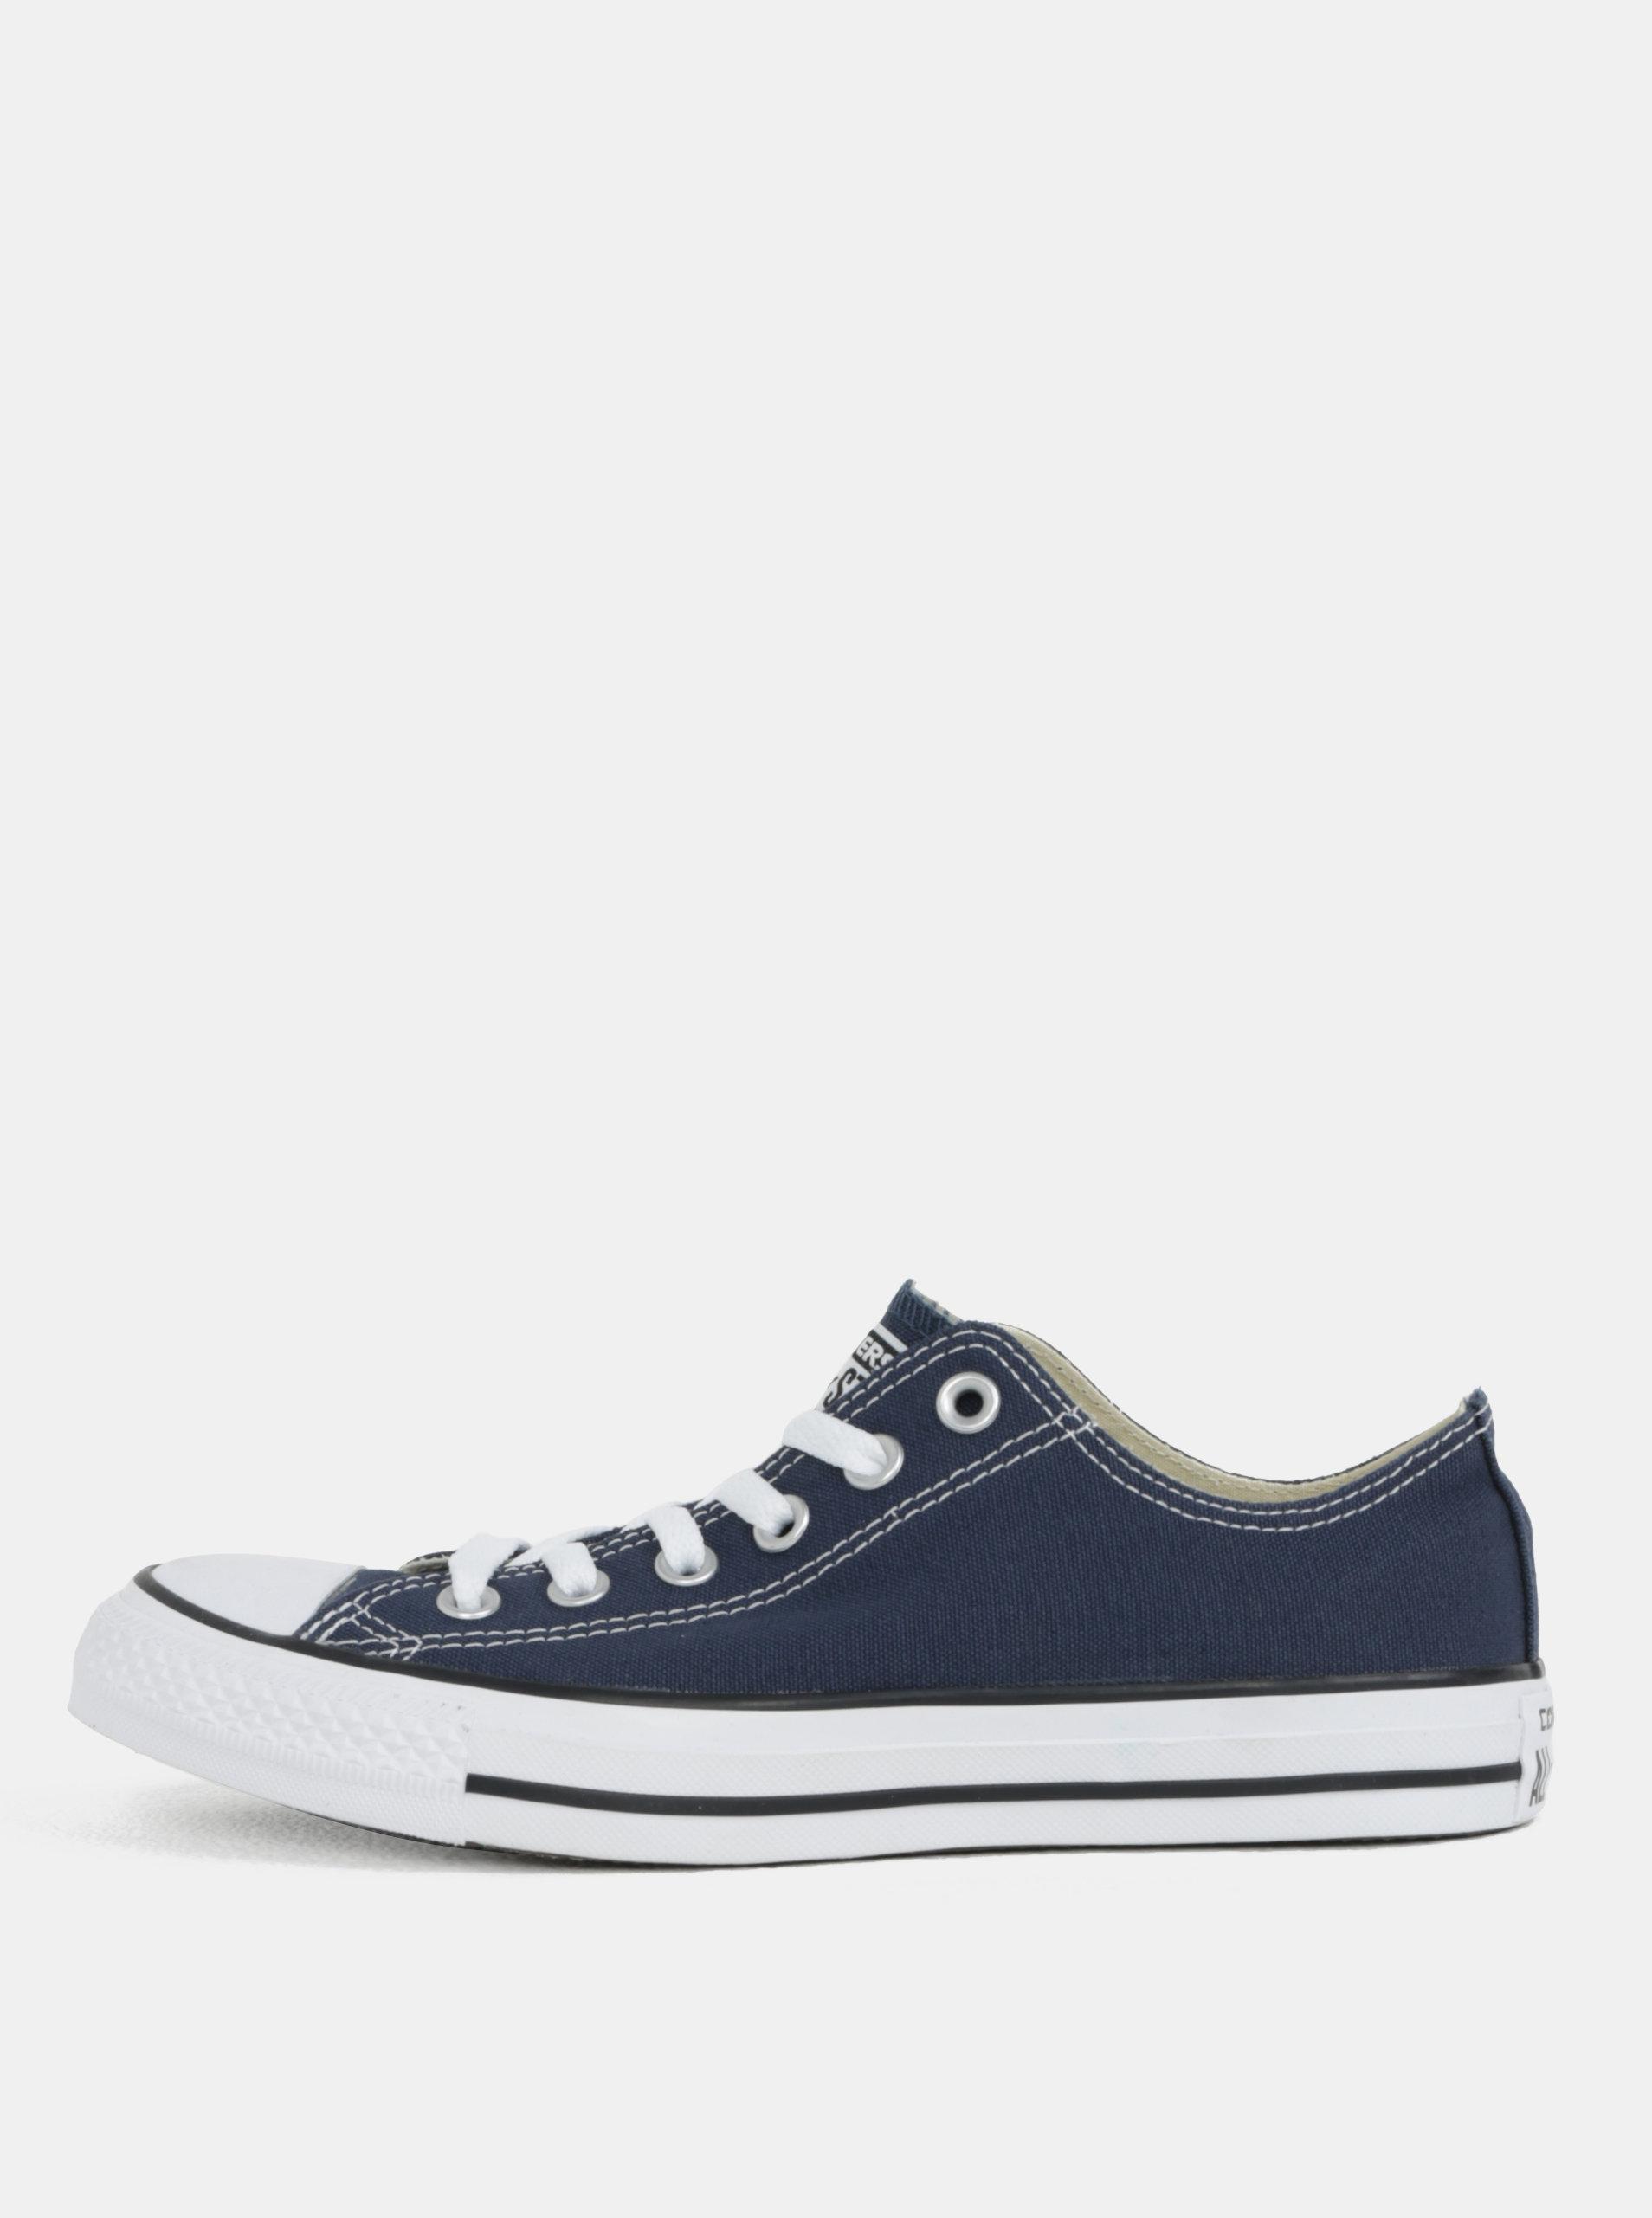 b05d25be8f69e Tmavě modré tenisky Converse Chuck Taylor All Star | ZOOT.cz